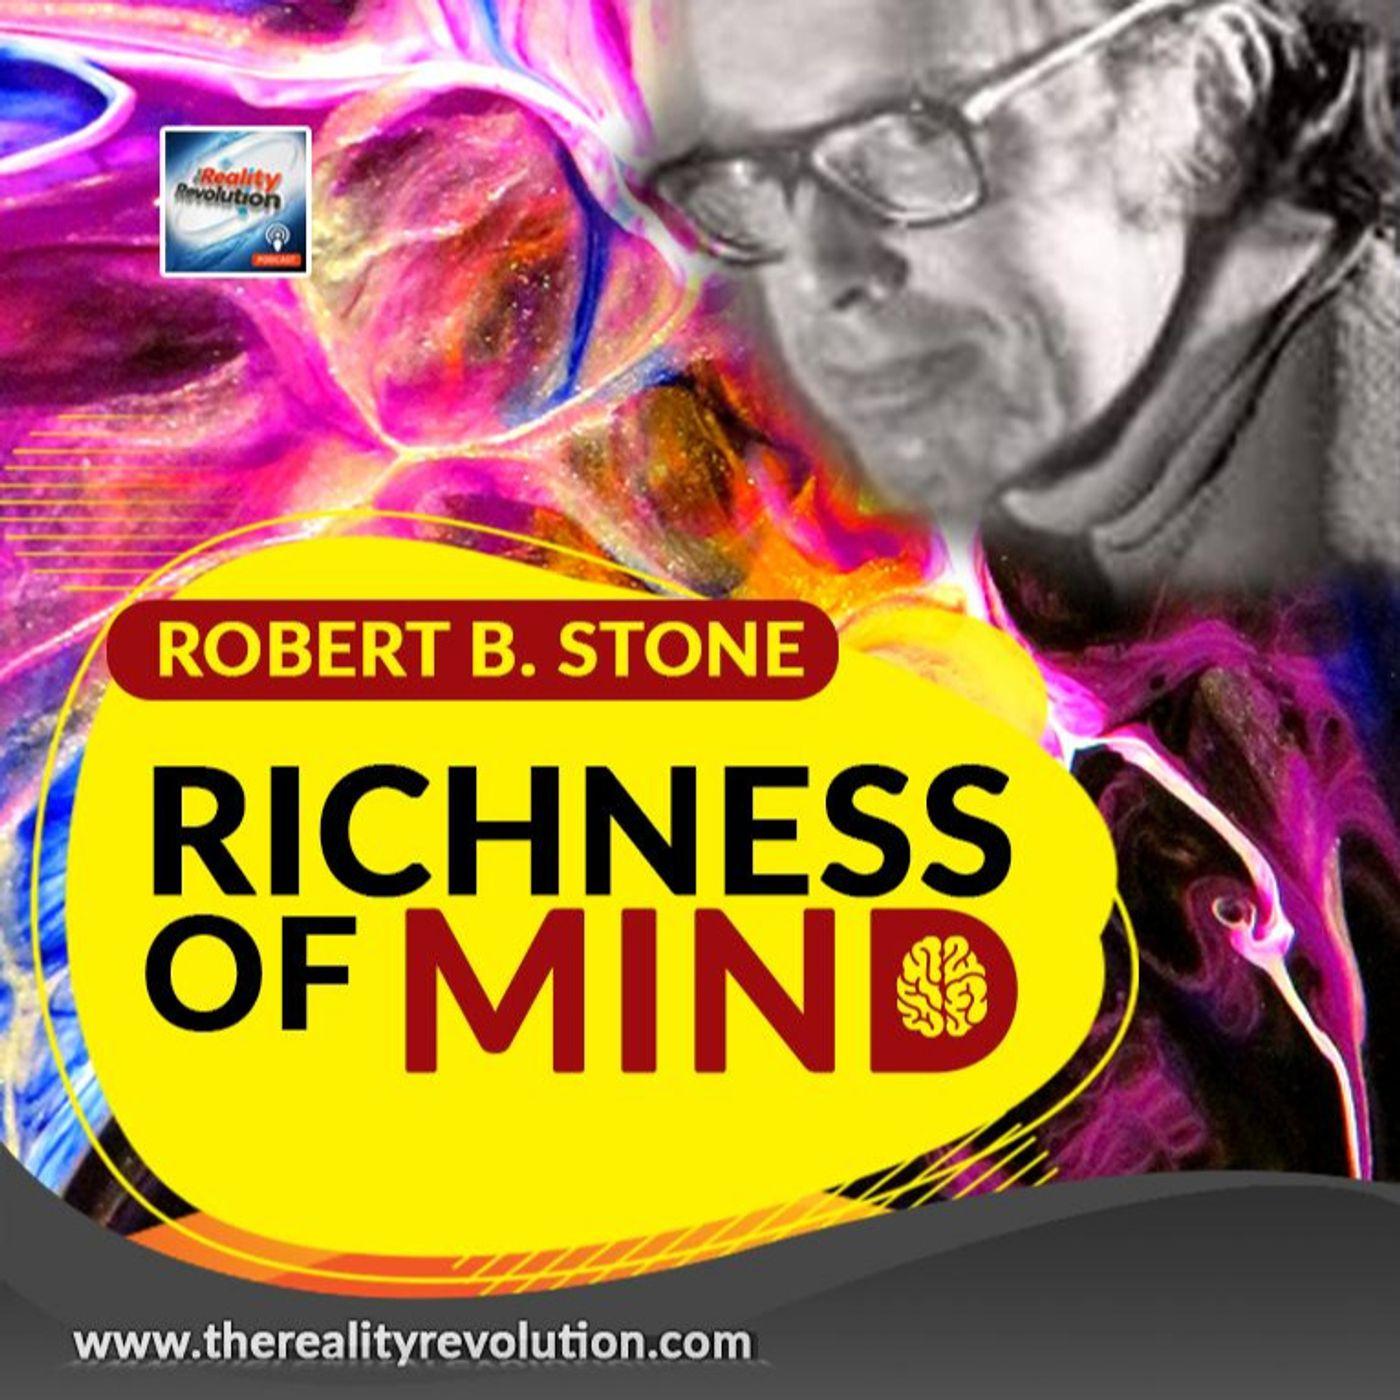 Robert B Stone - Richness Of Mind